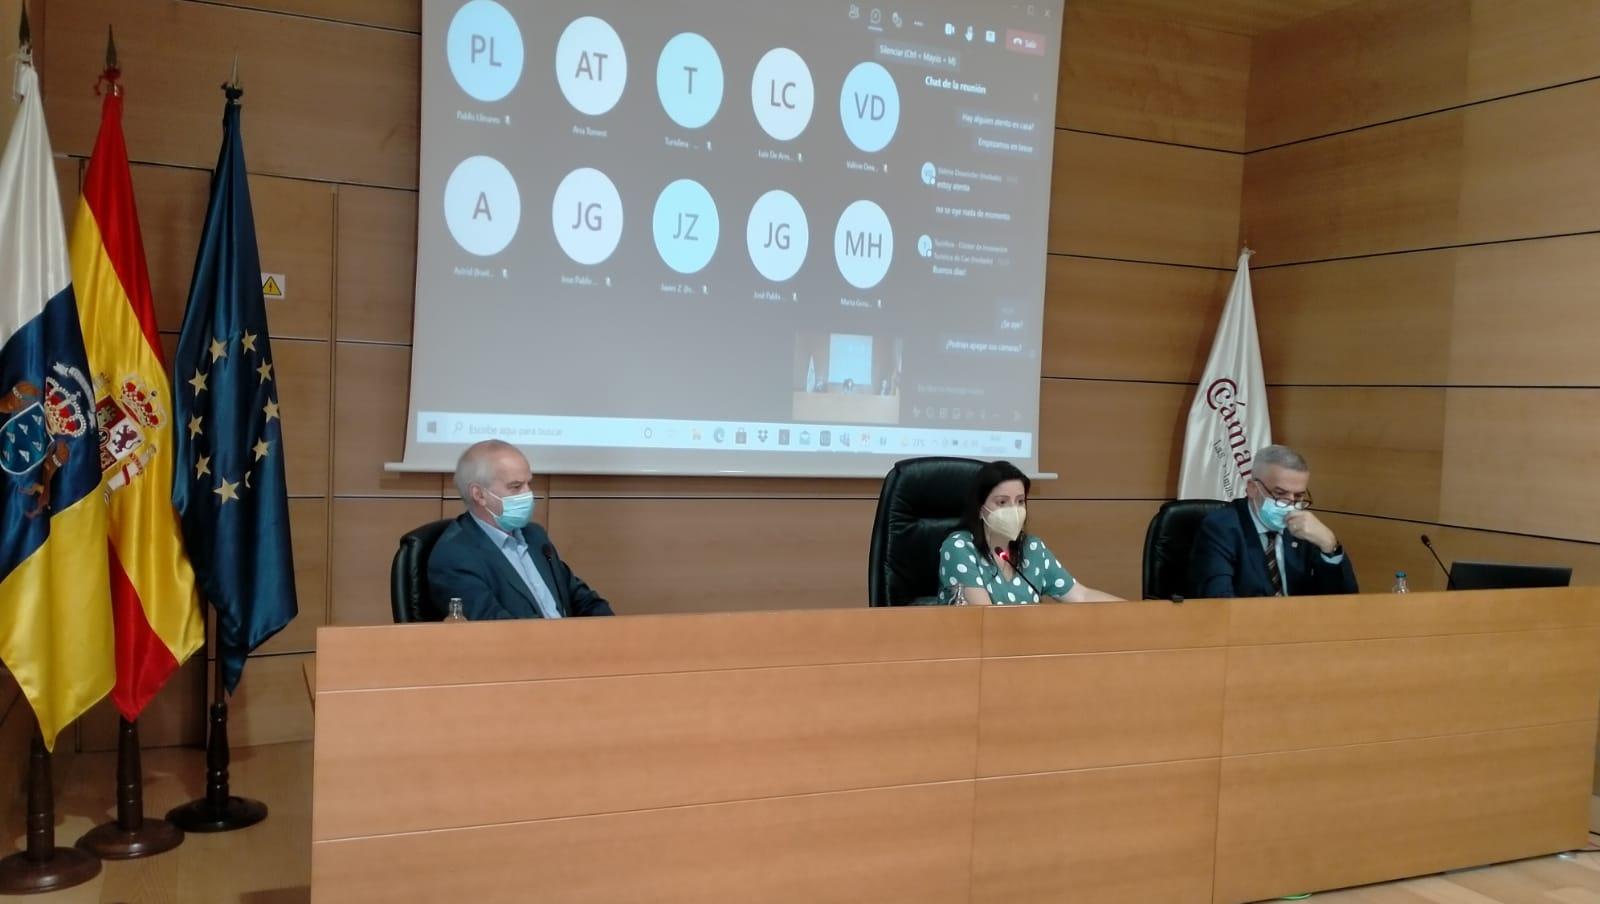 Asamblea General del Clúster de Turismo Innova Gran Canaria